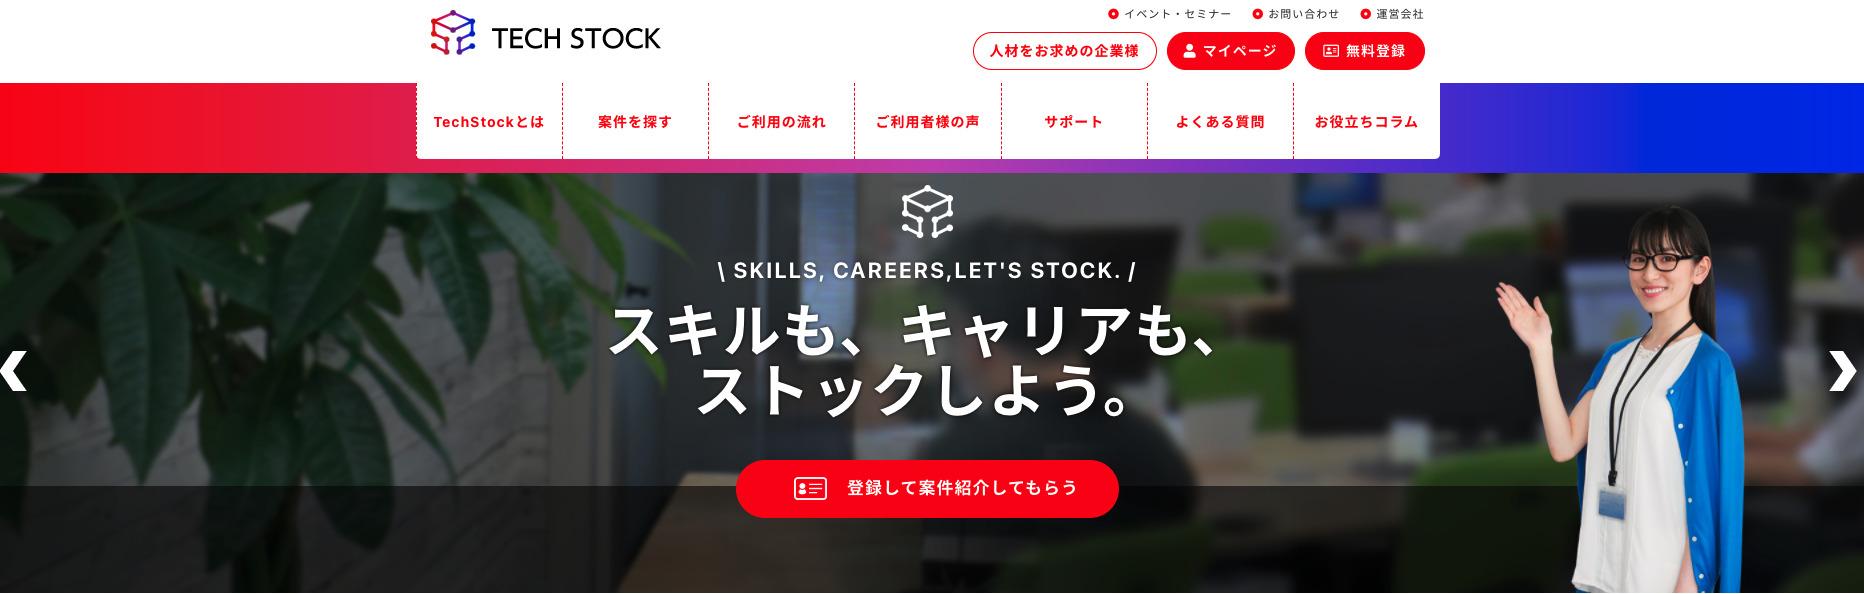 Tech Stock とは